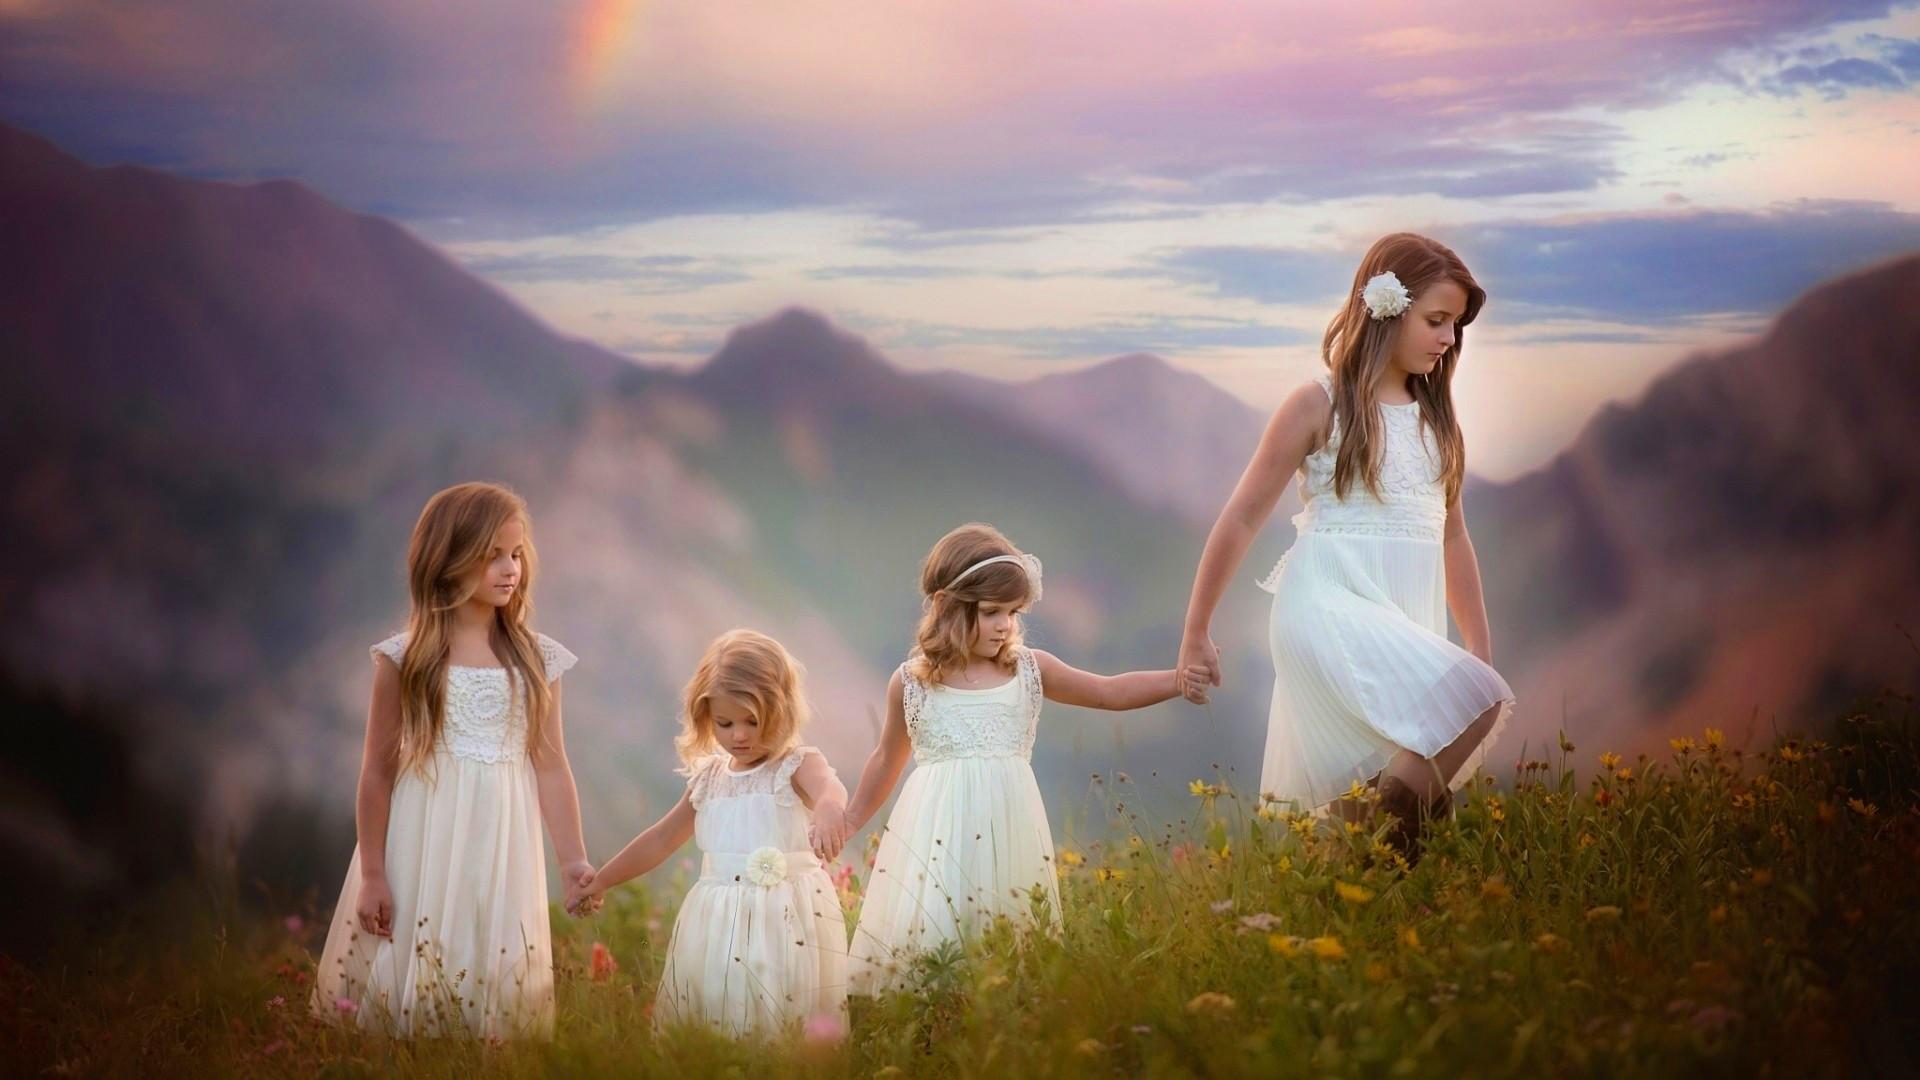 Res: 1920x1080, Cute Sisters Wallpaper HD For Desktop, Laptop & Mobile